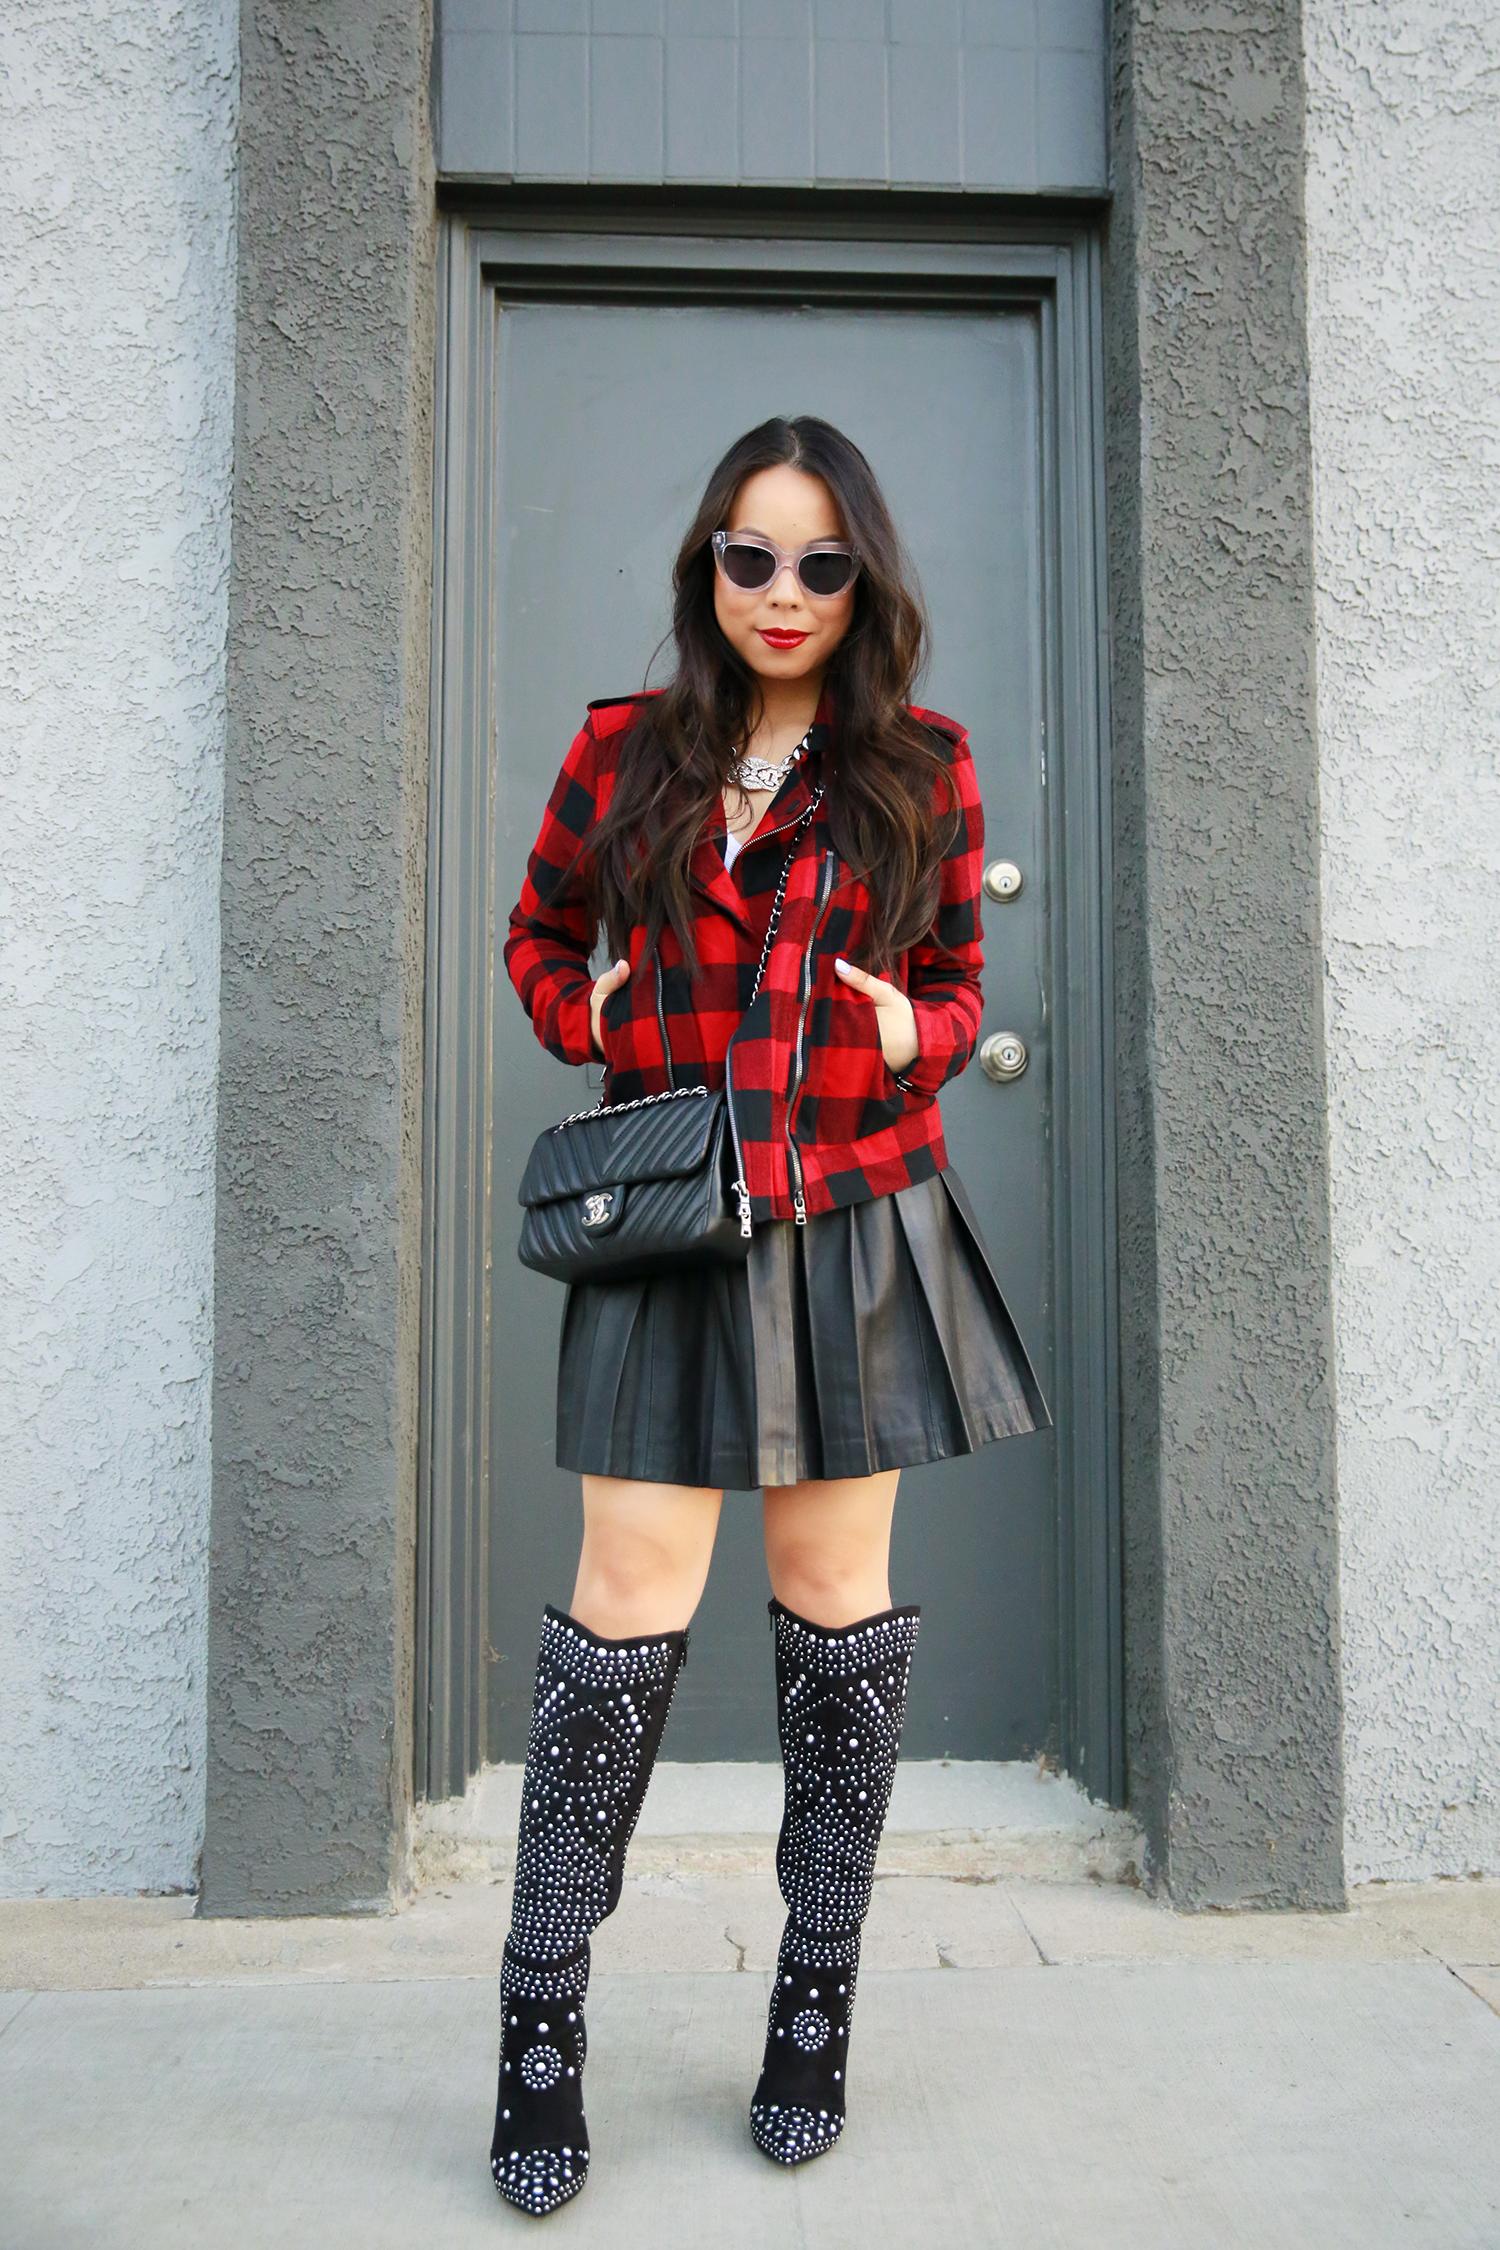 44 best Glam Rock - #Dressmaking Inspiration images on Pinterest Glam rock inspired fashion